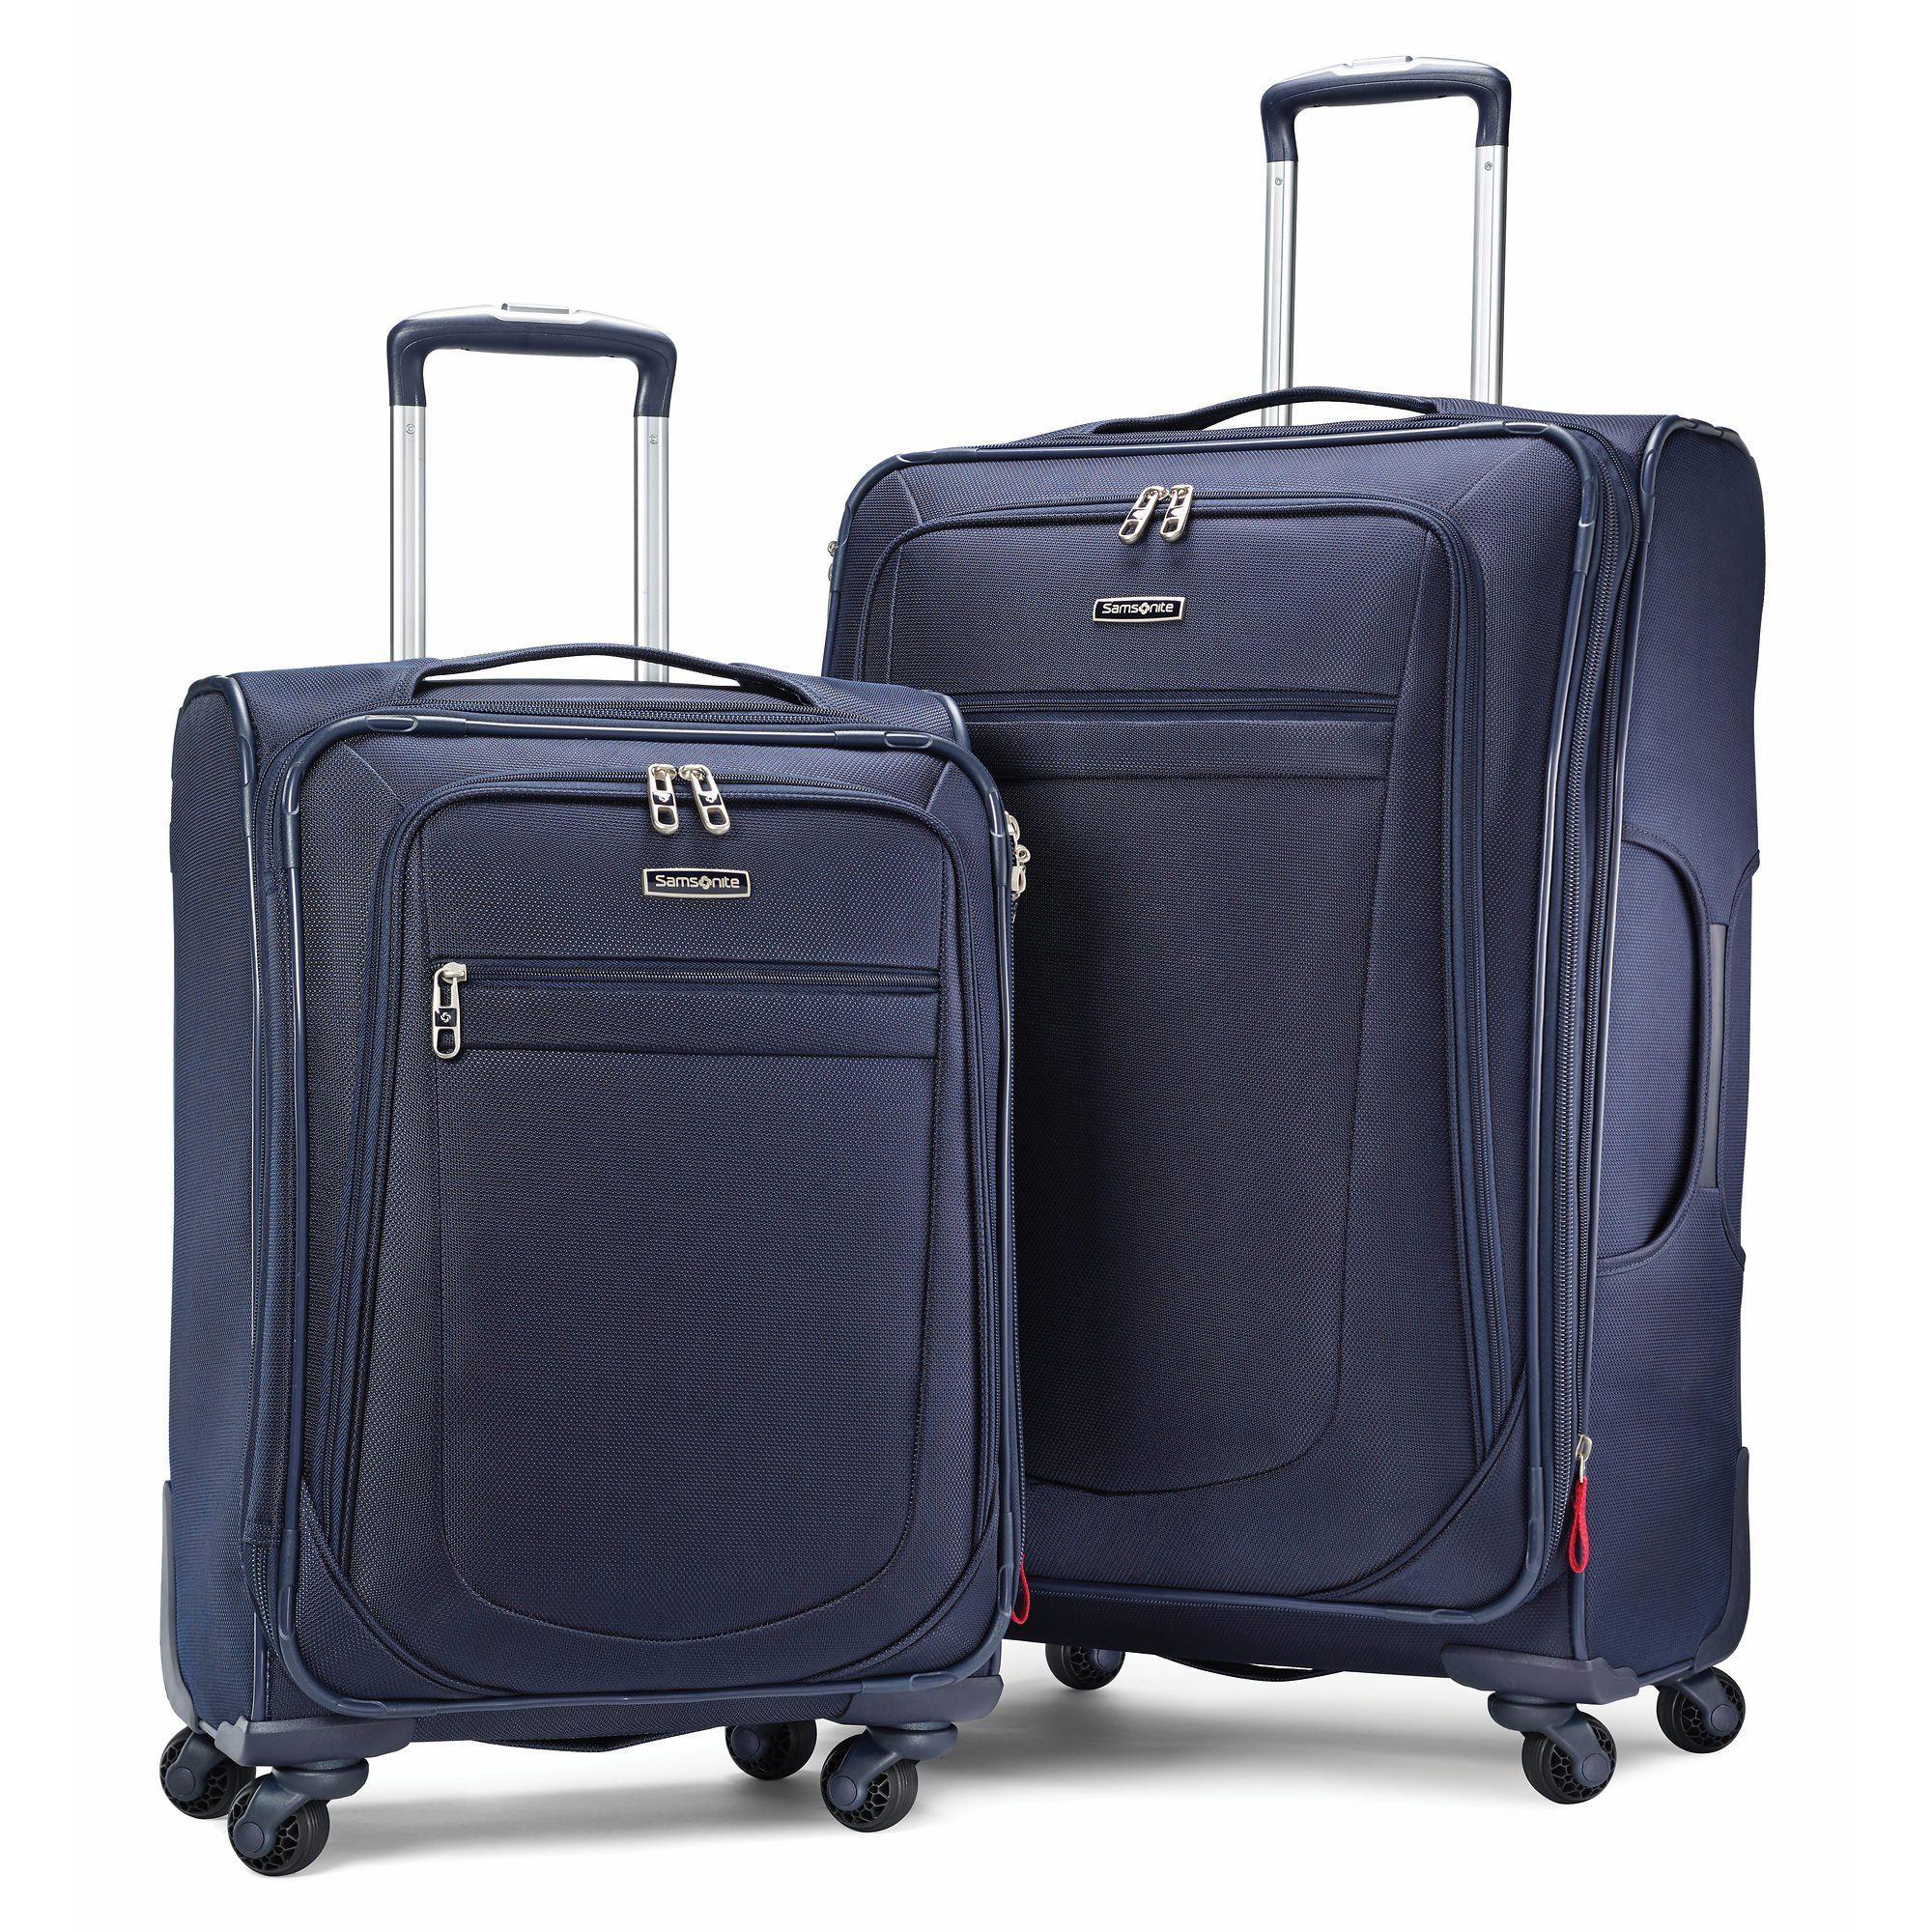 Samsonite Lite 4.0 Sphere 2-Piece Spinner Luggage Set 27